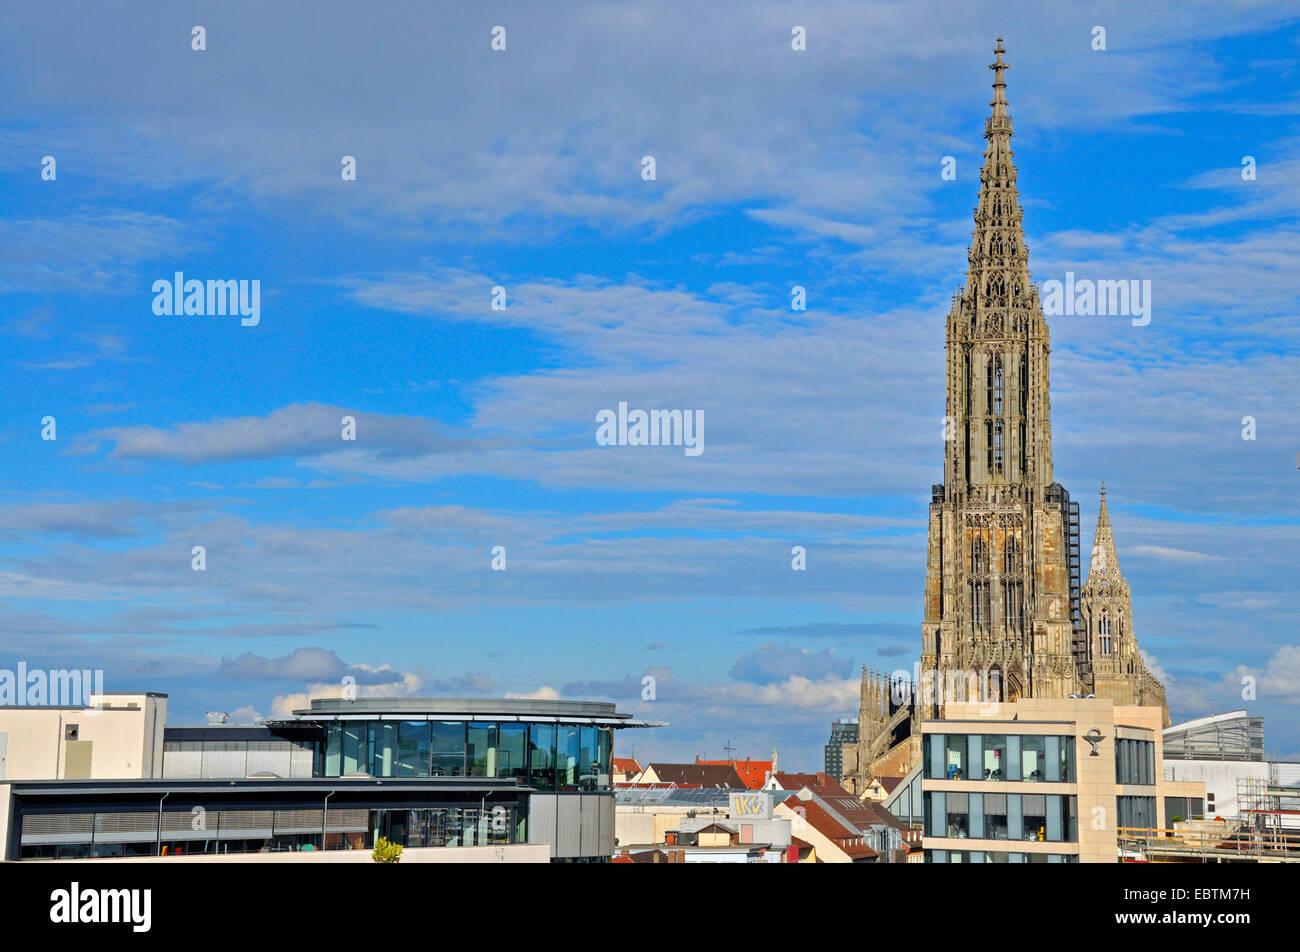 Ulm Minster, tallest church in the world, Germany, Baden-Wuerttemberg, Ulm Stock Photo